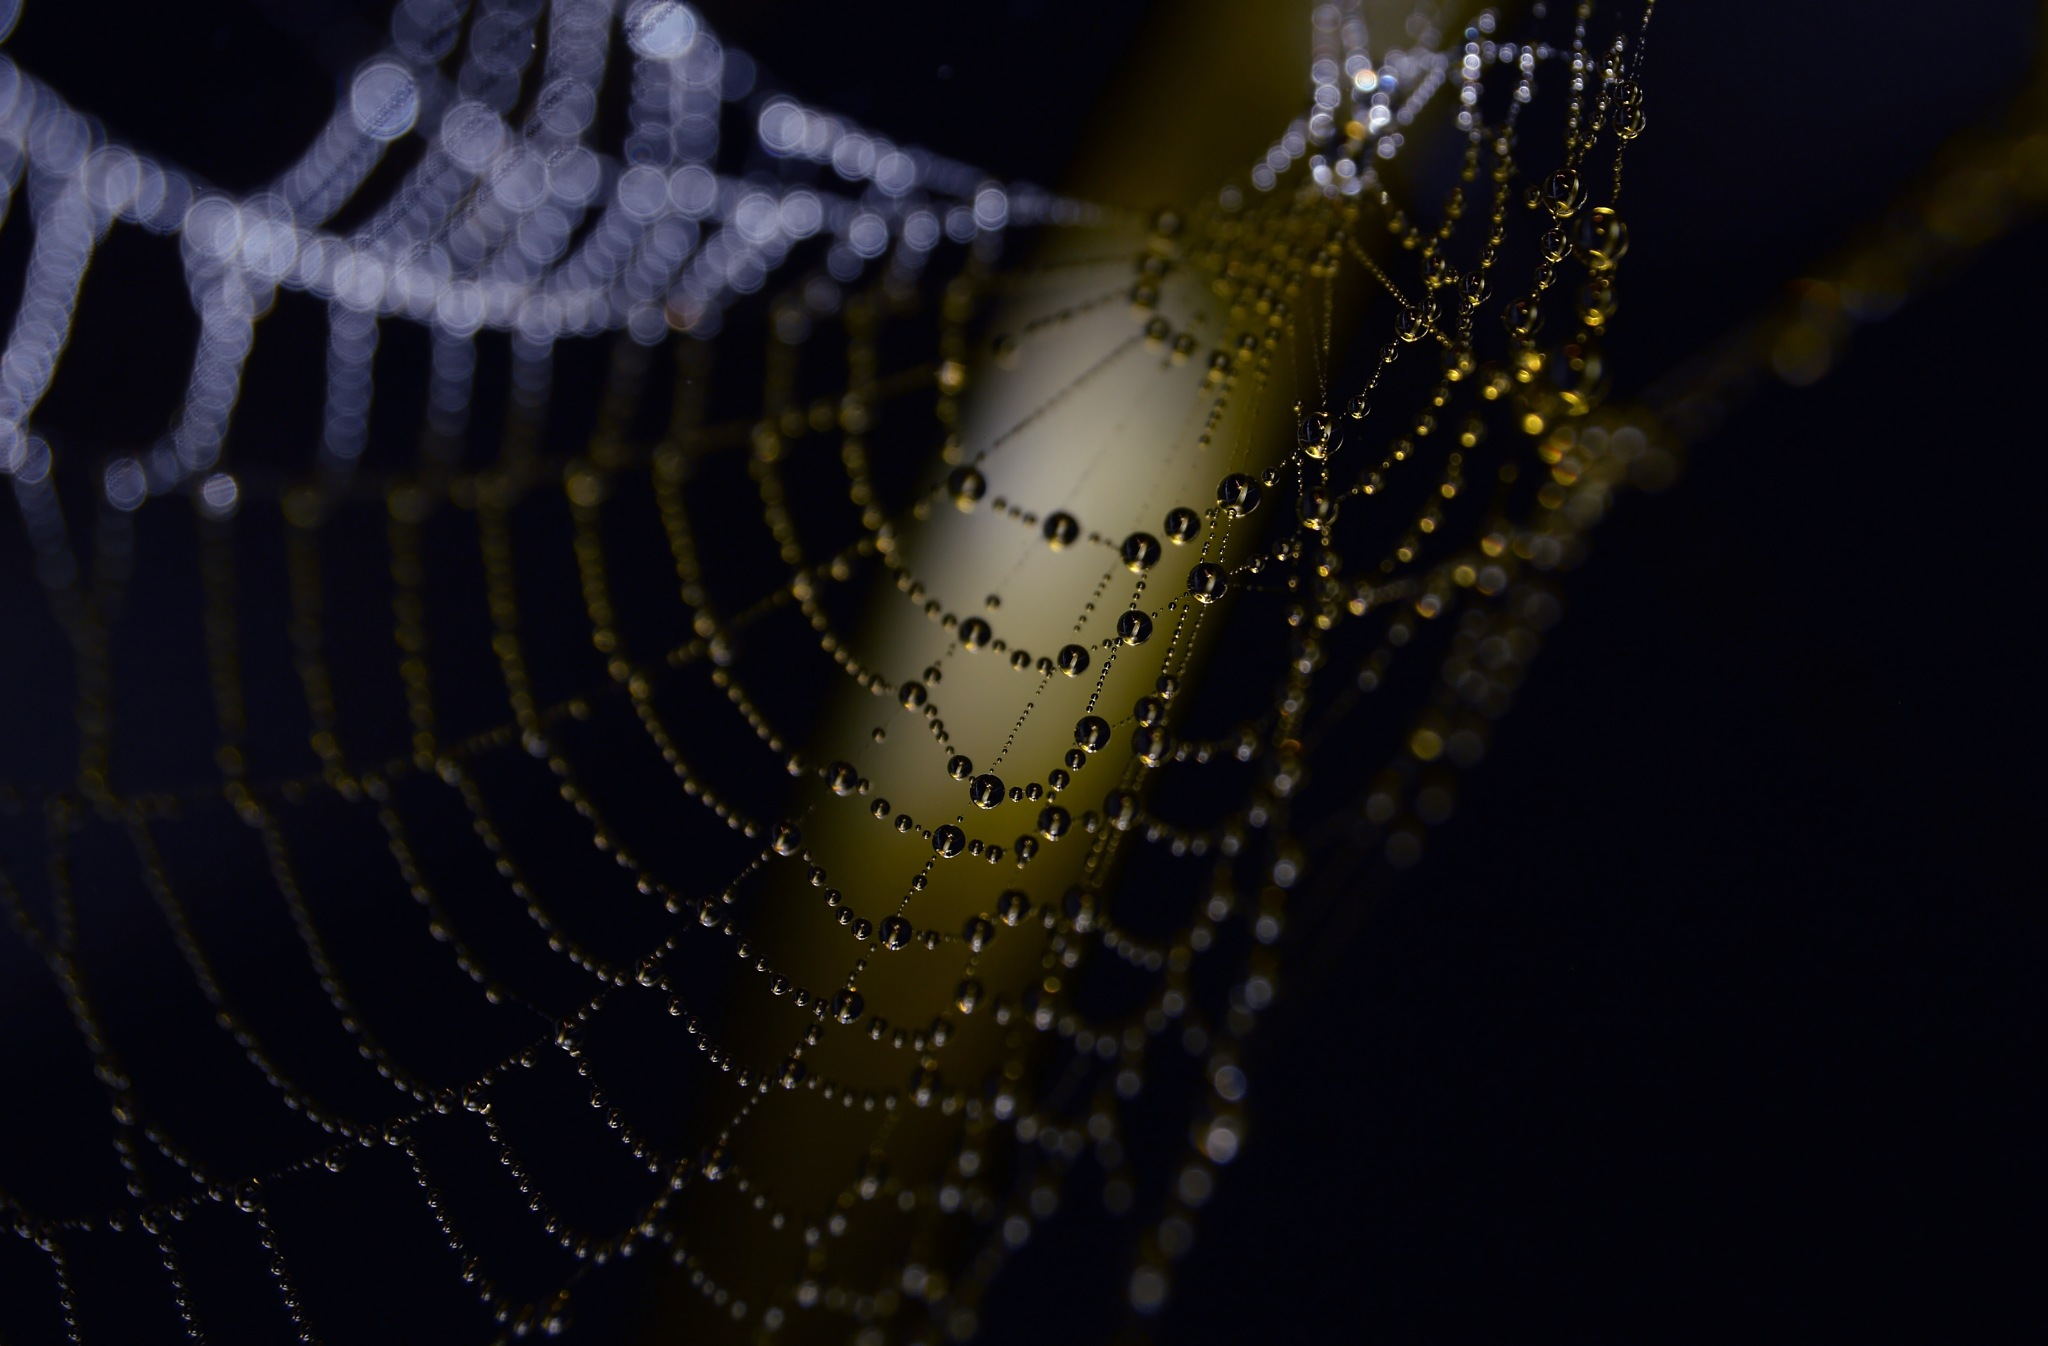 waterweb by lynncam26